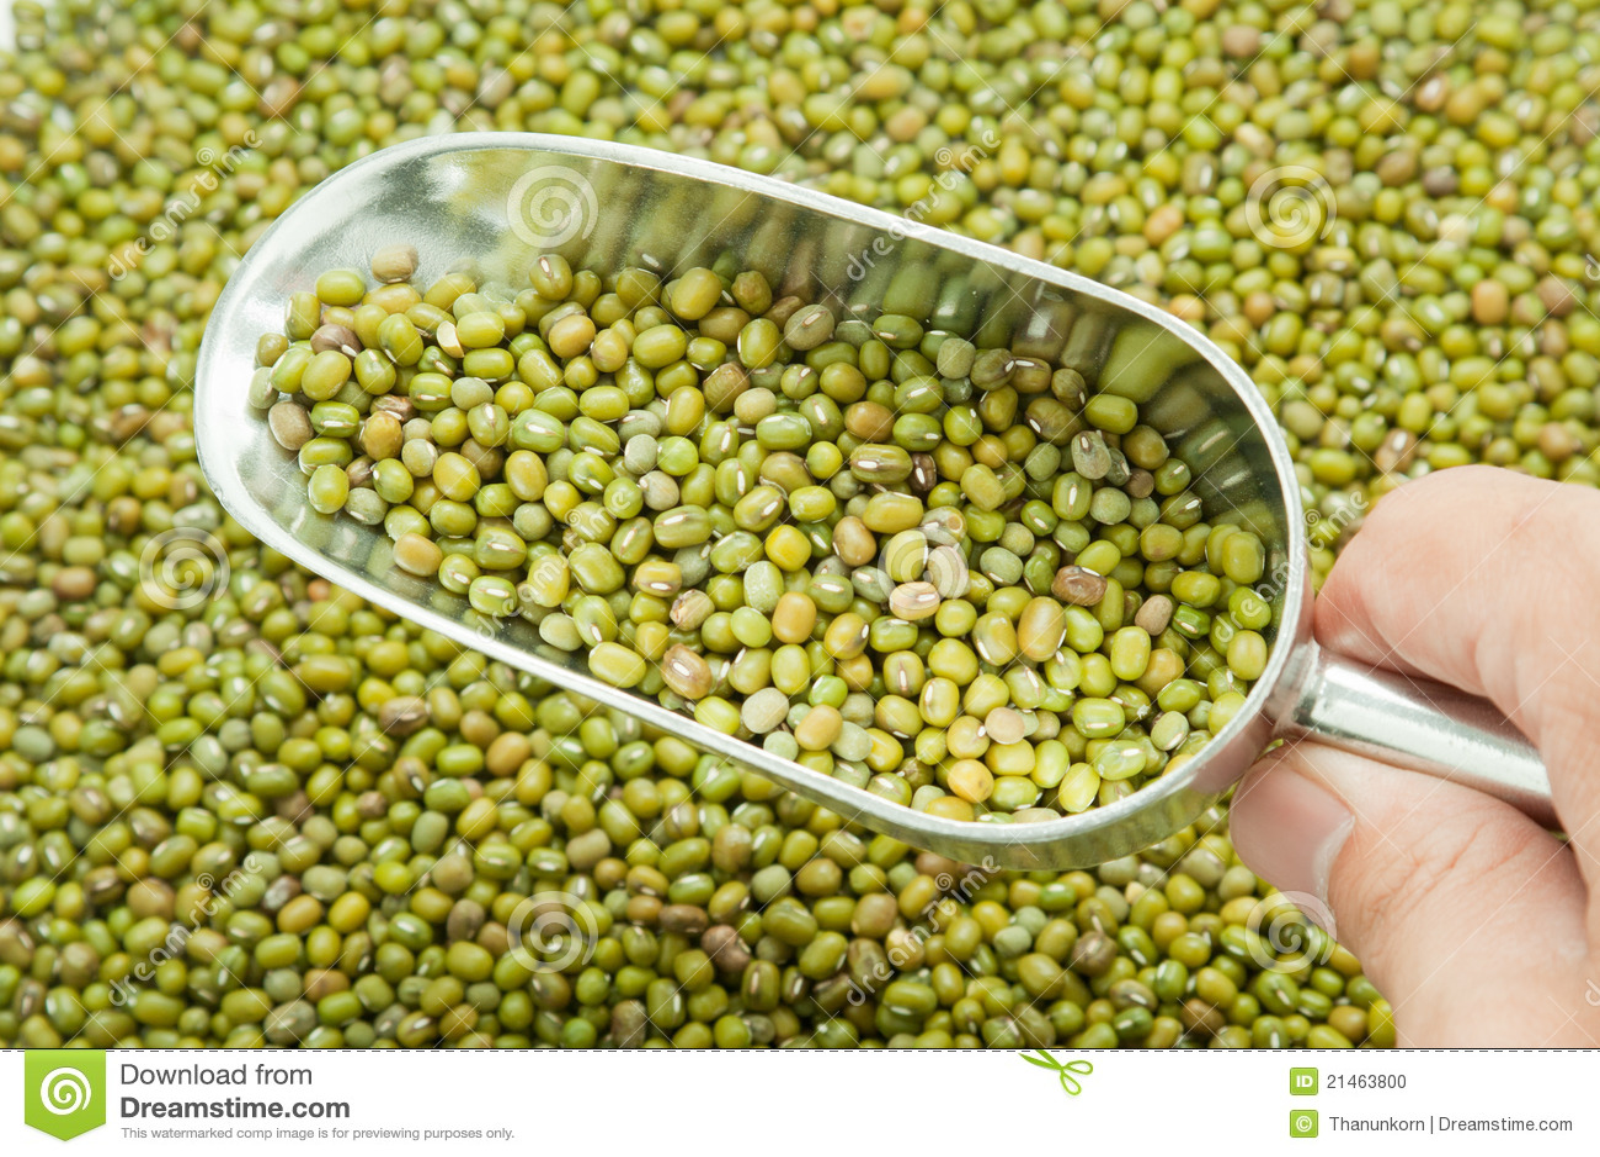 Scoop of greens